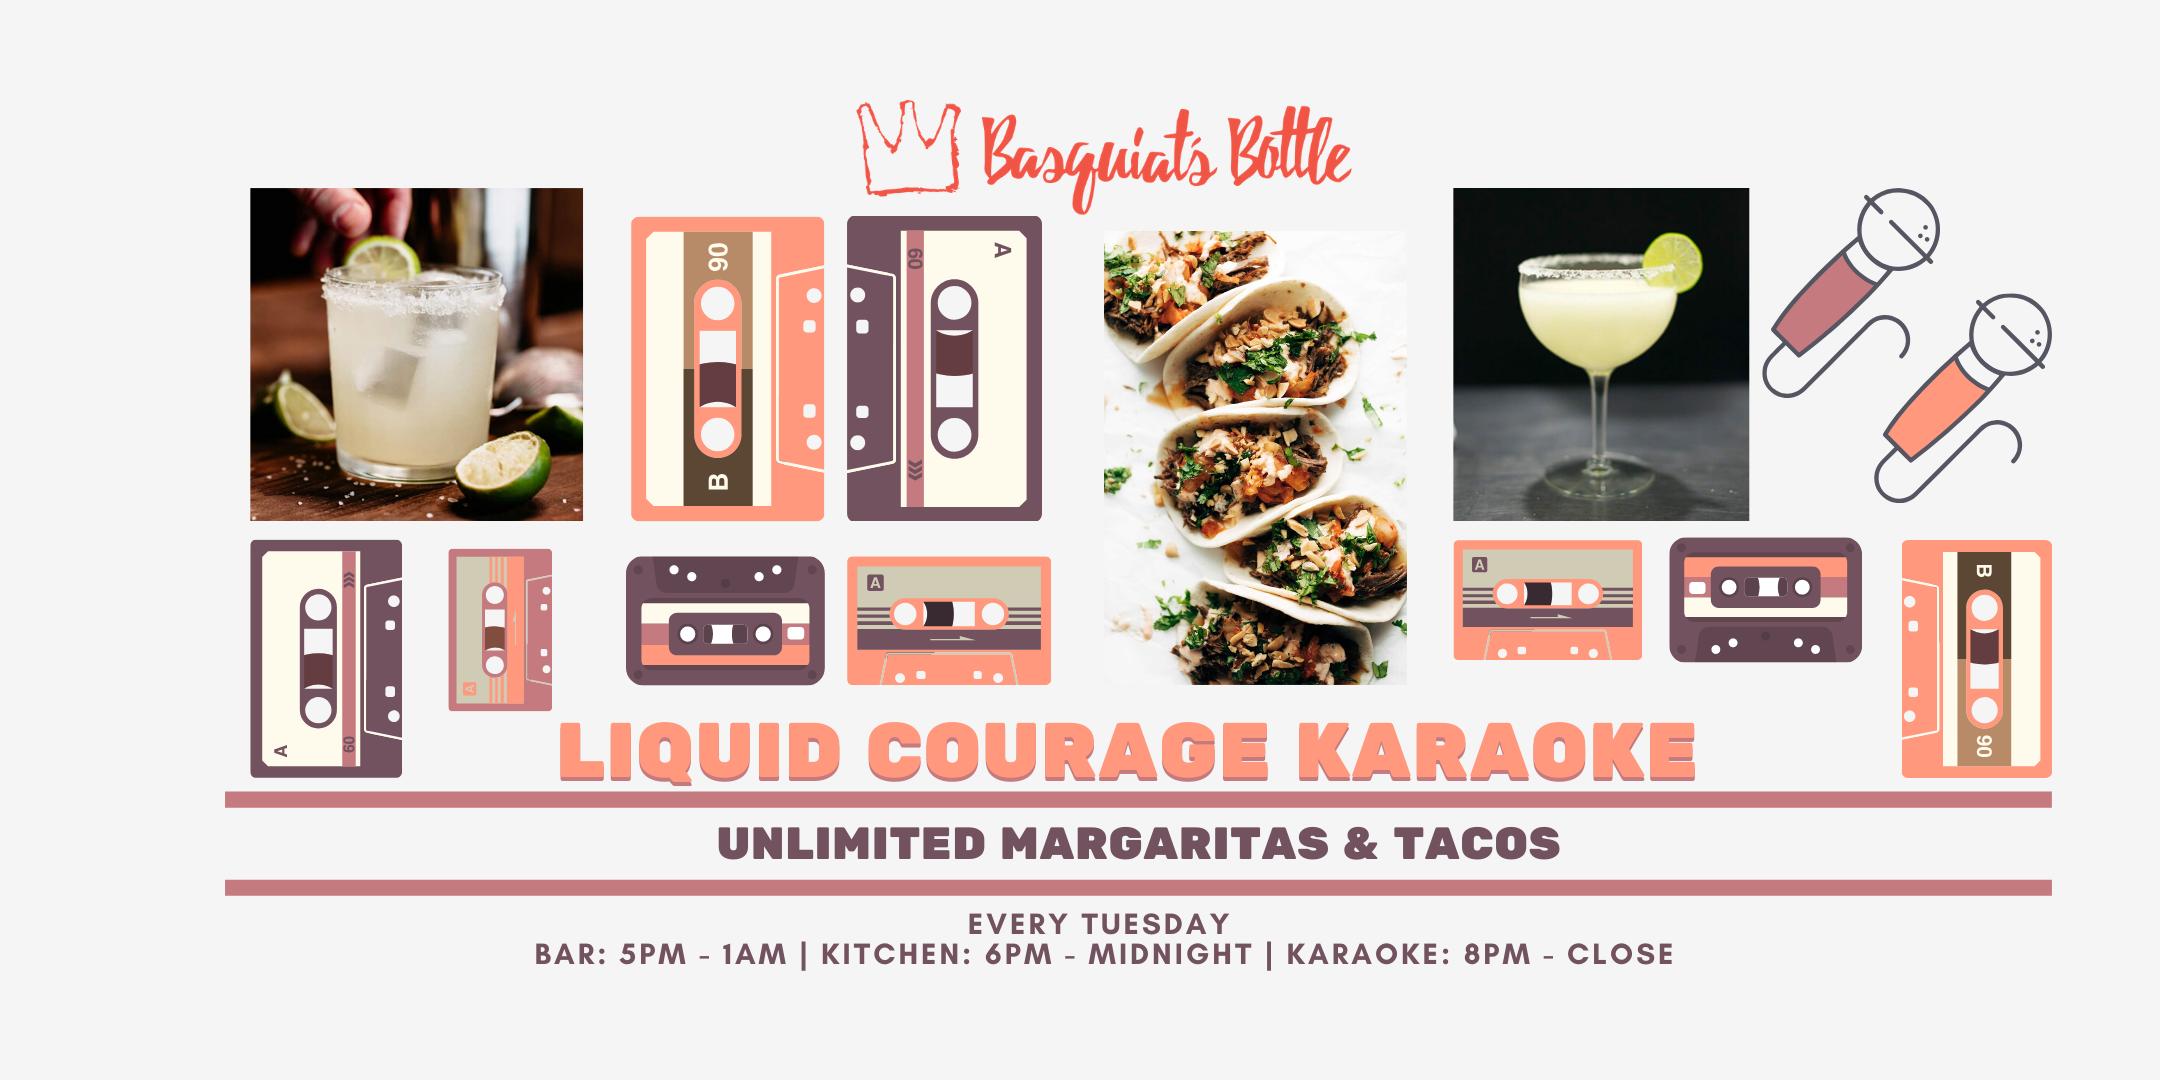 Liquid Courage Karaoke